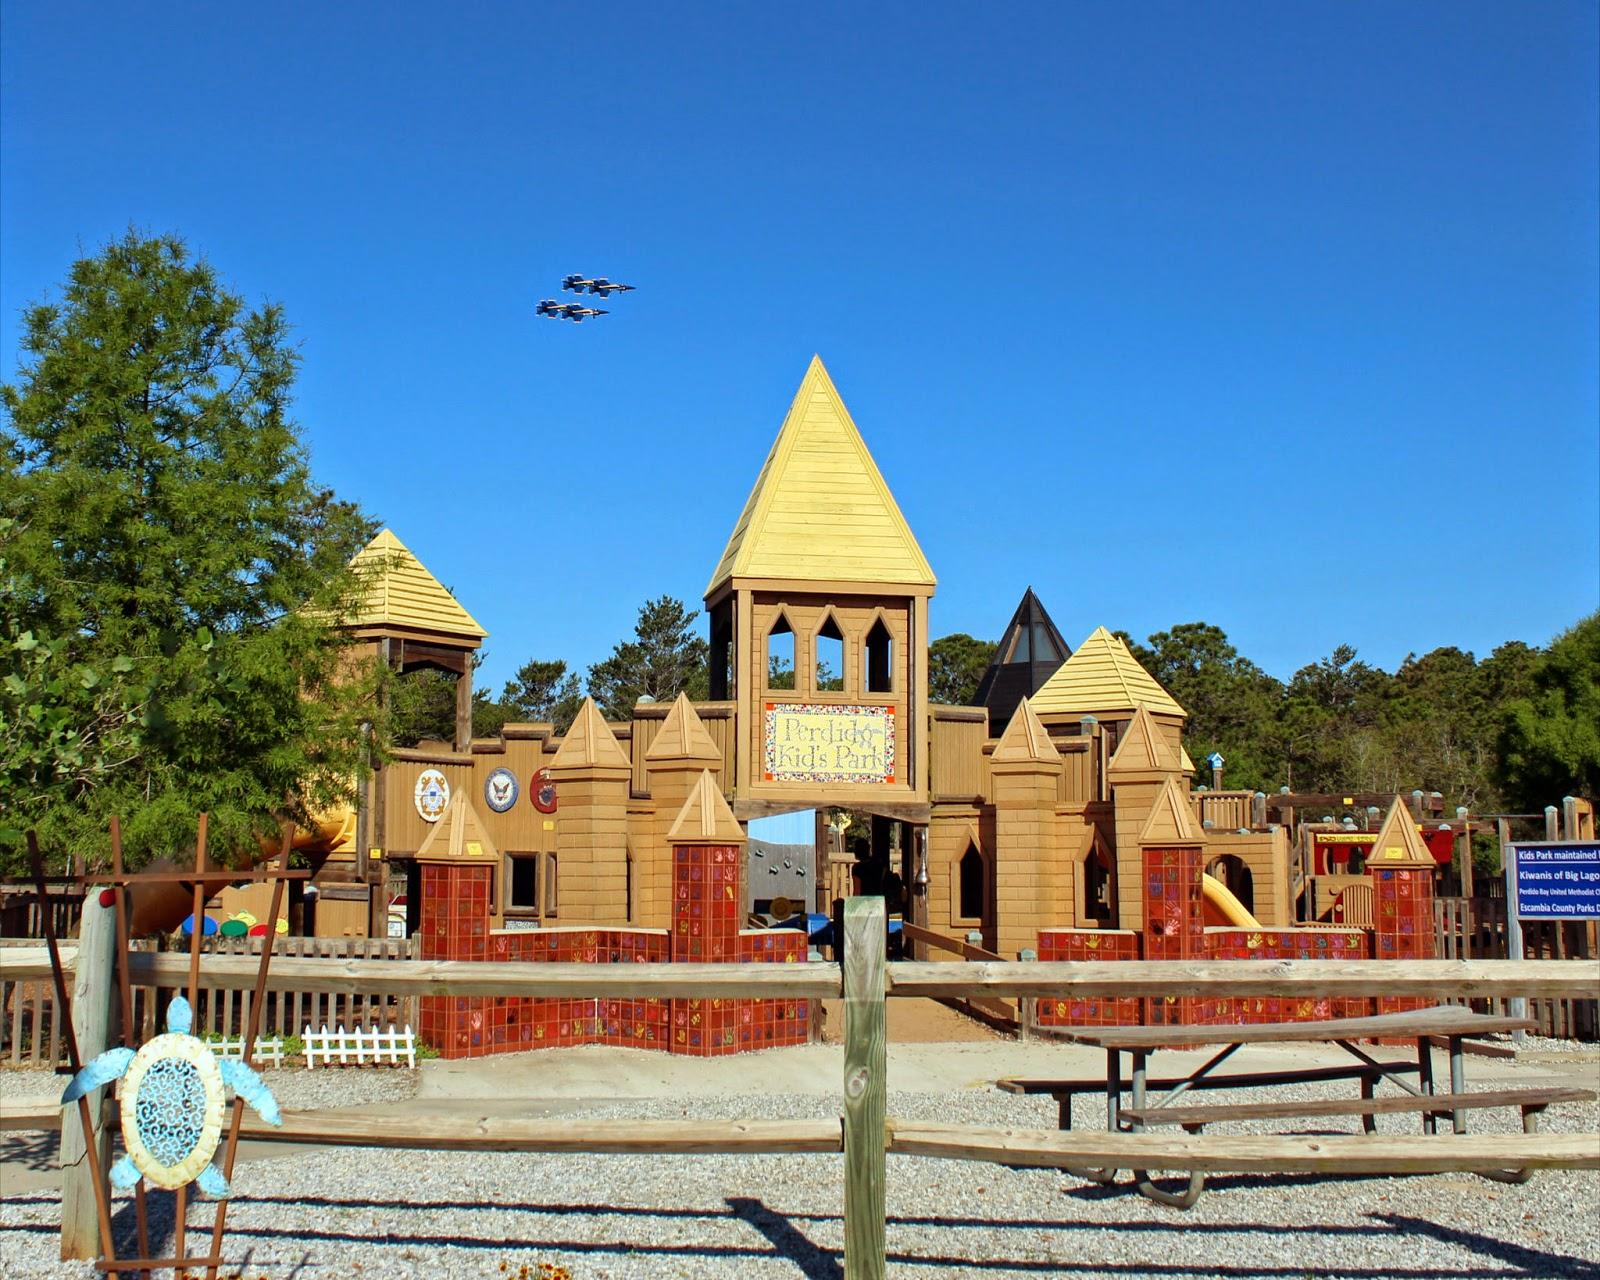 Perdido Kids Park, Pensacola, FL 32507